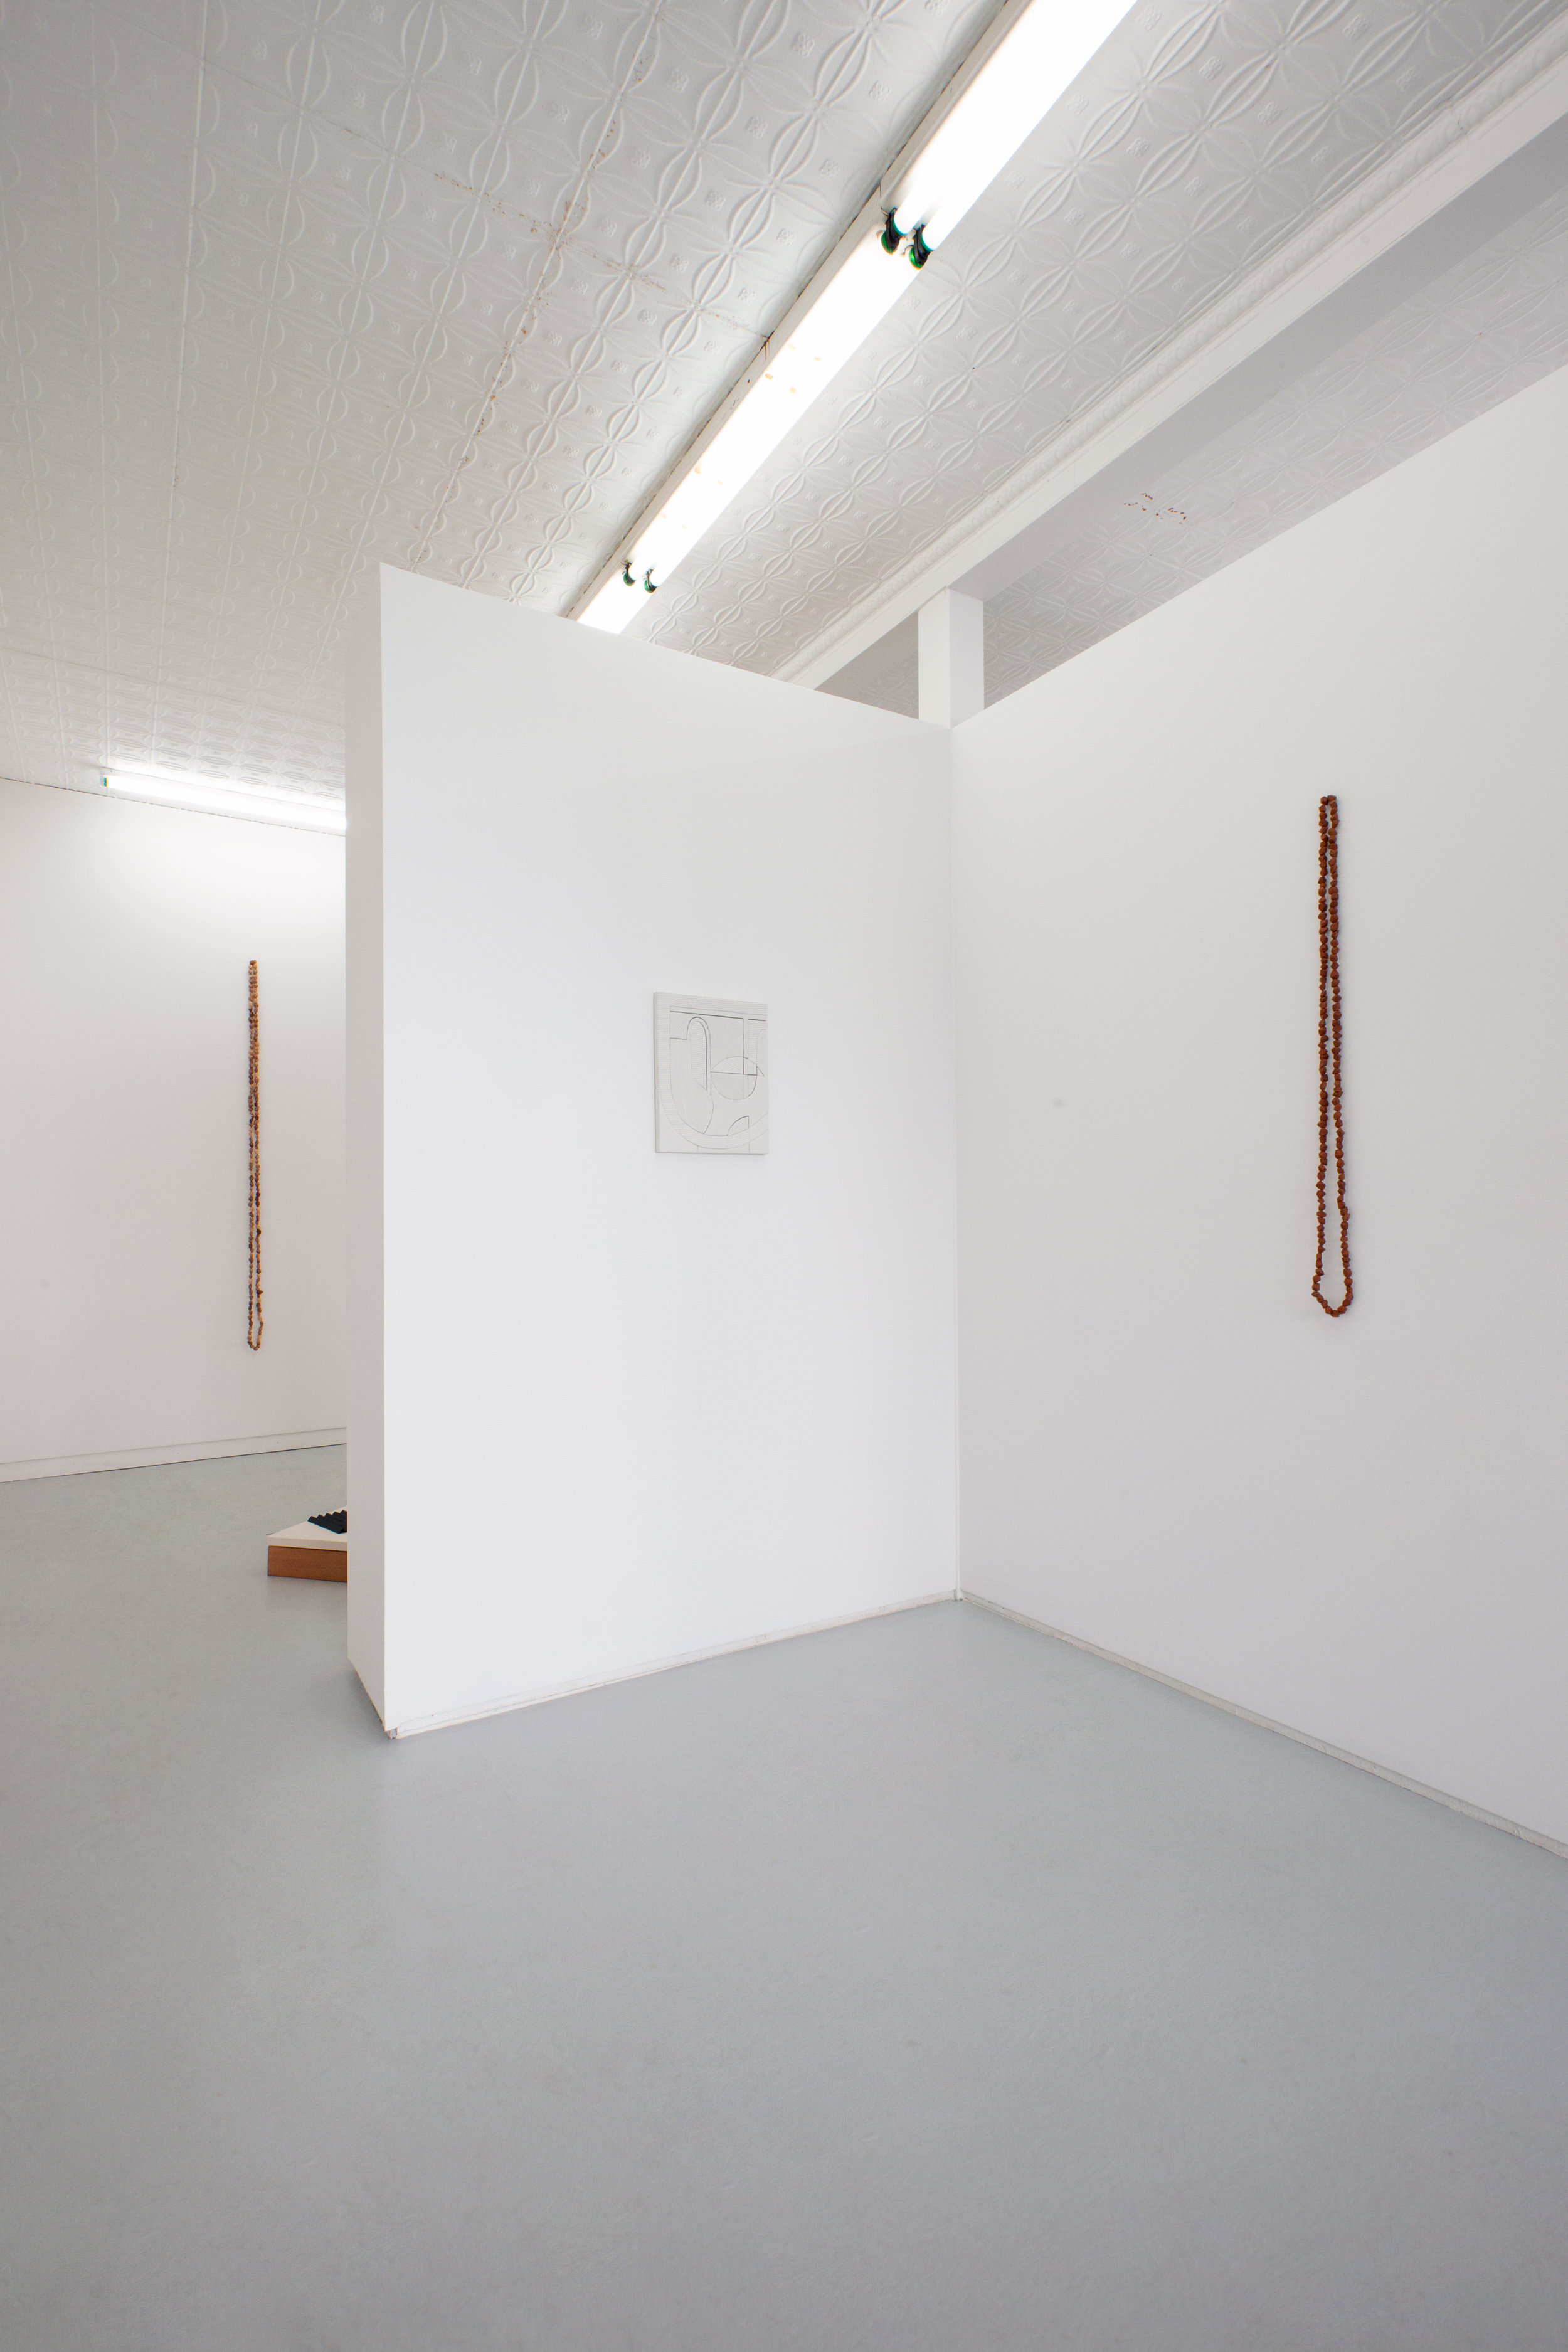 Elizabeth_Atterbury-Night_Comes_In-Installation_View_008.jpg